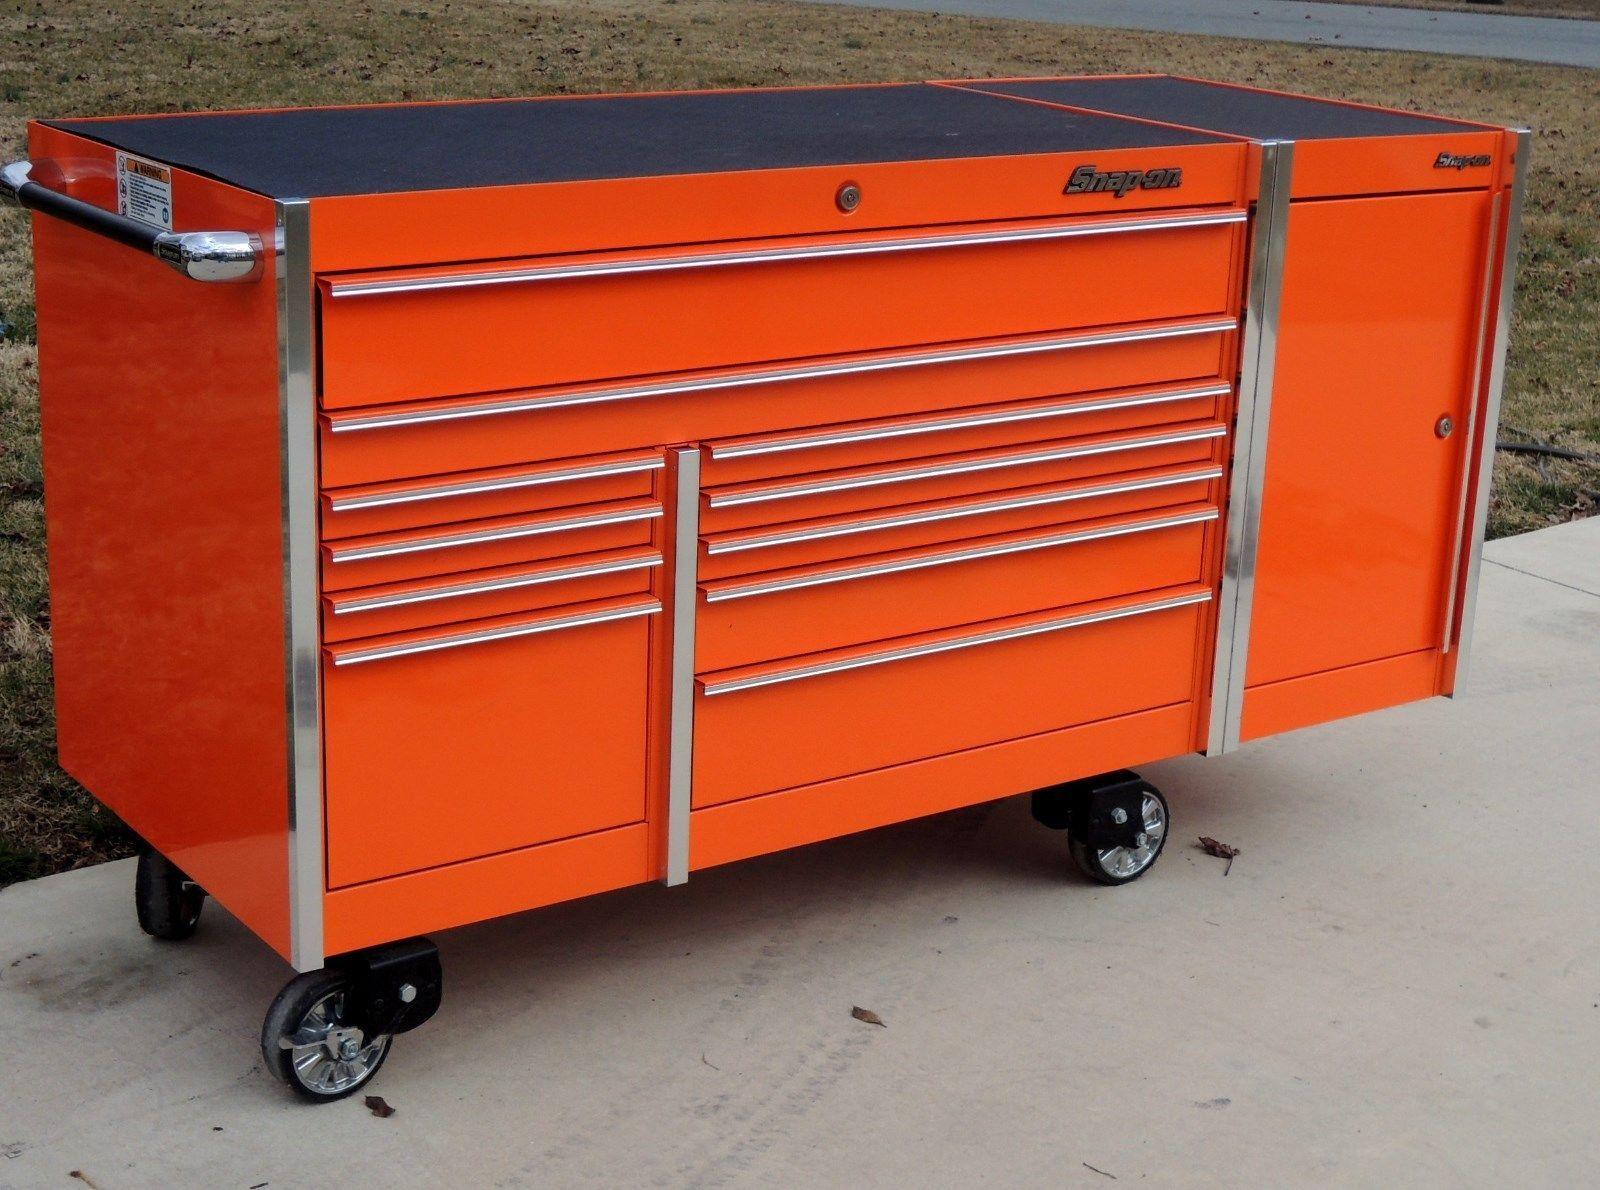 Snap On Orange Krl7022 Toolbox Tool Box Krl7015 Side Locker Work Mat Tool Box Tool Storage Tool Chest